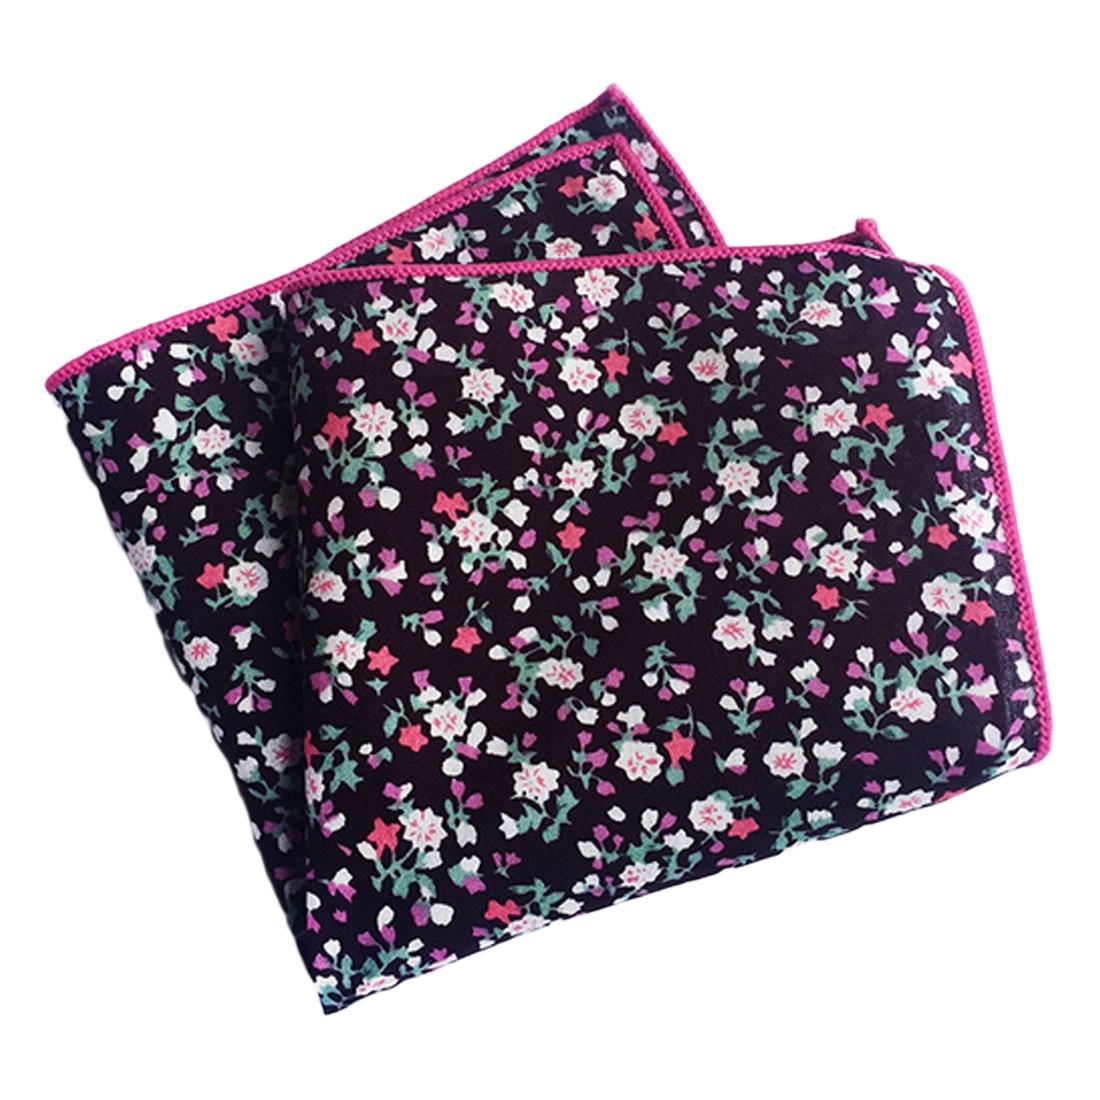 Men's Cotton Pocket Square Western Style Floral Handkerchief For Suit Pocket Wedding Square Paisley 25x25cm